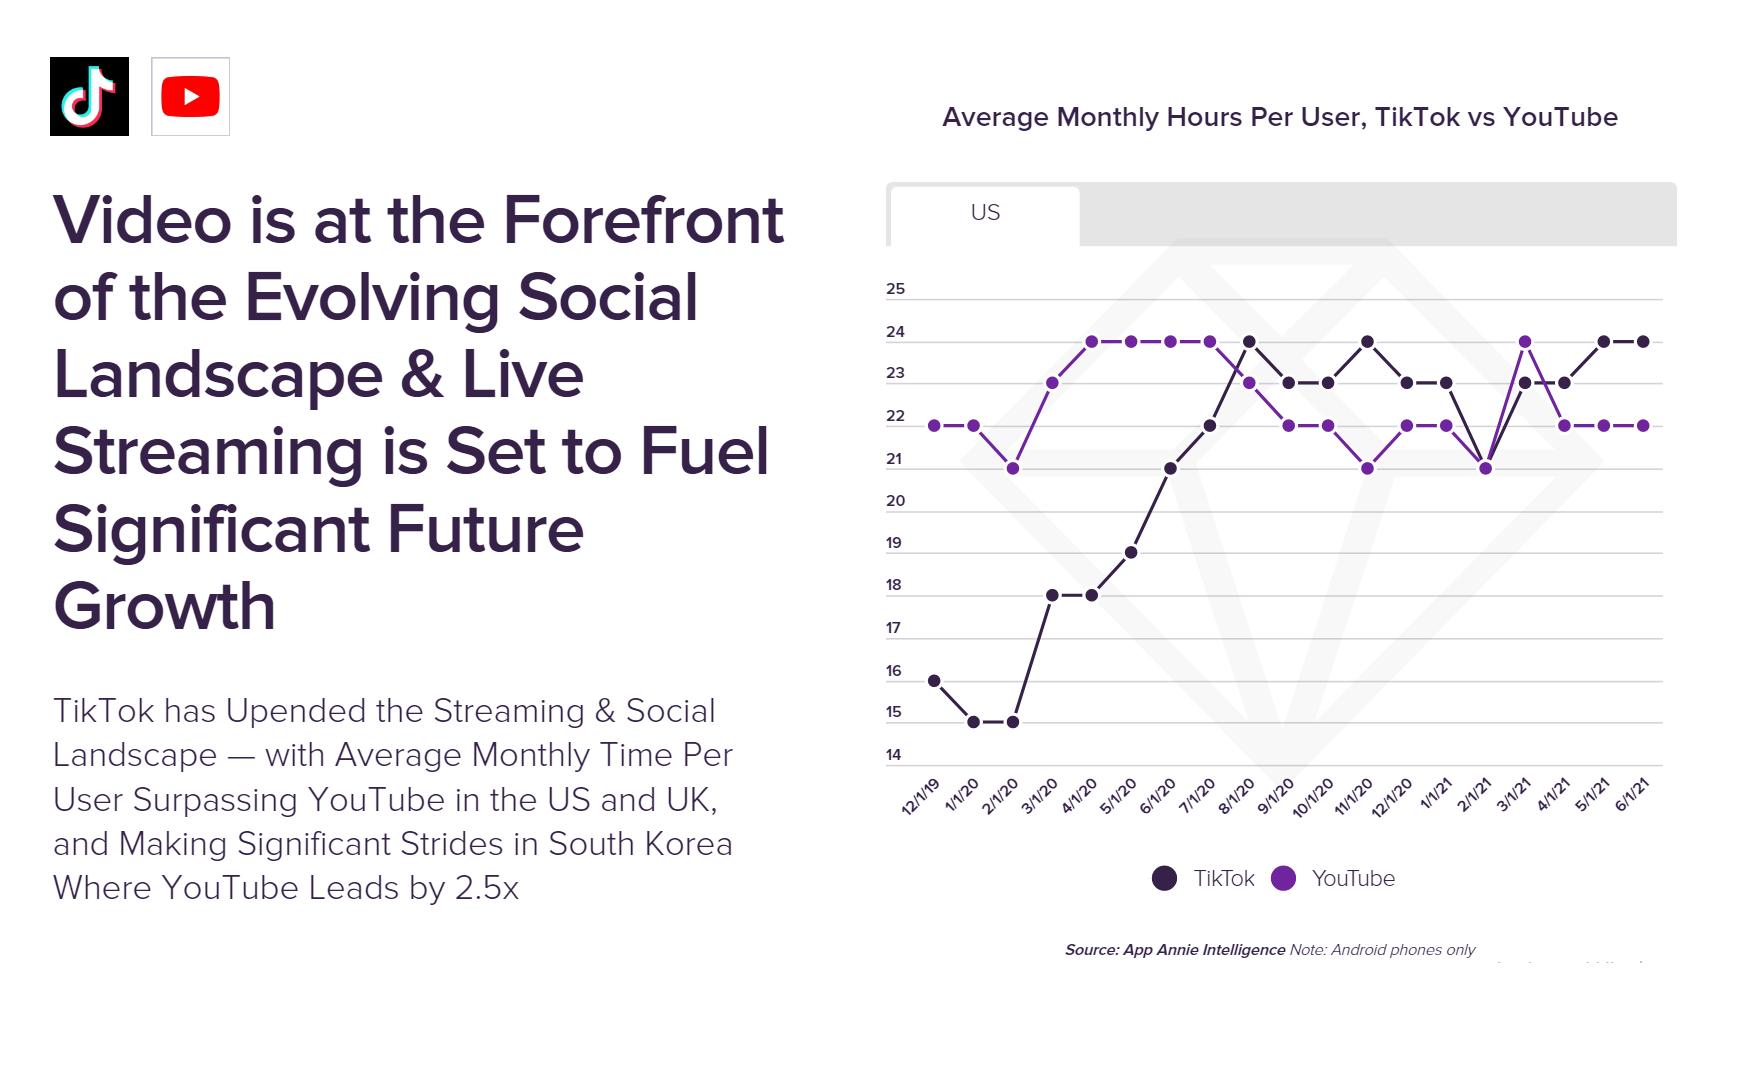 TikTok surpasses YouTube in US for average watch hours